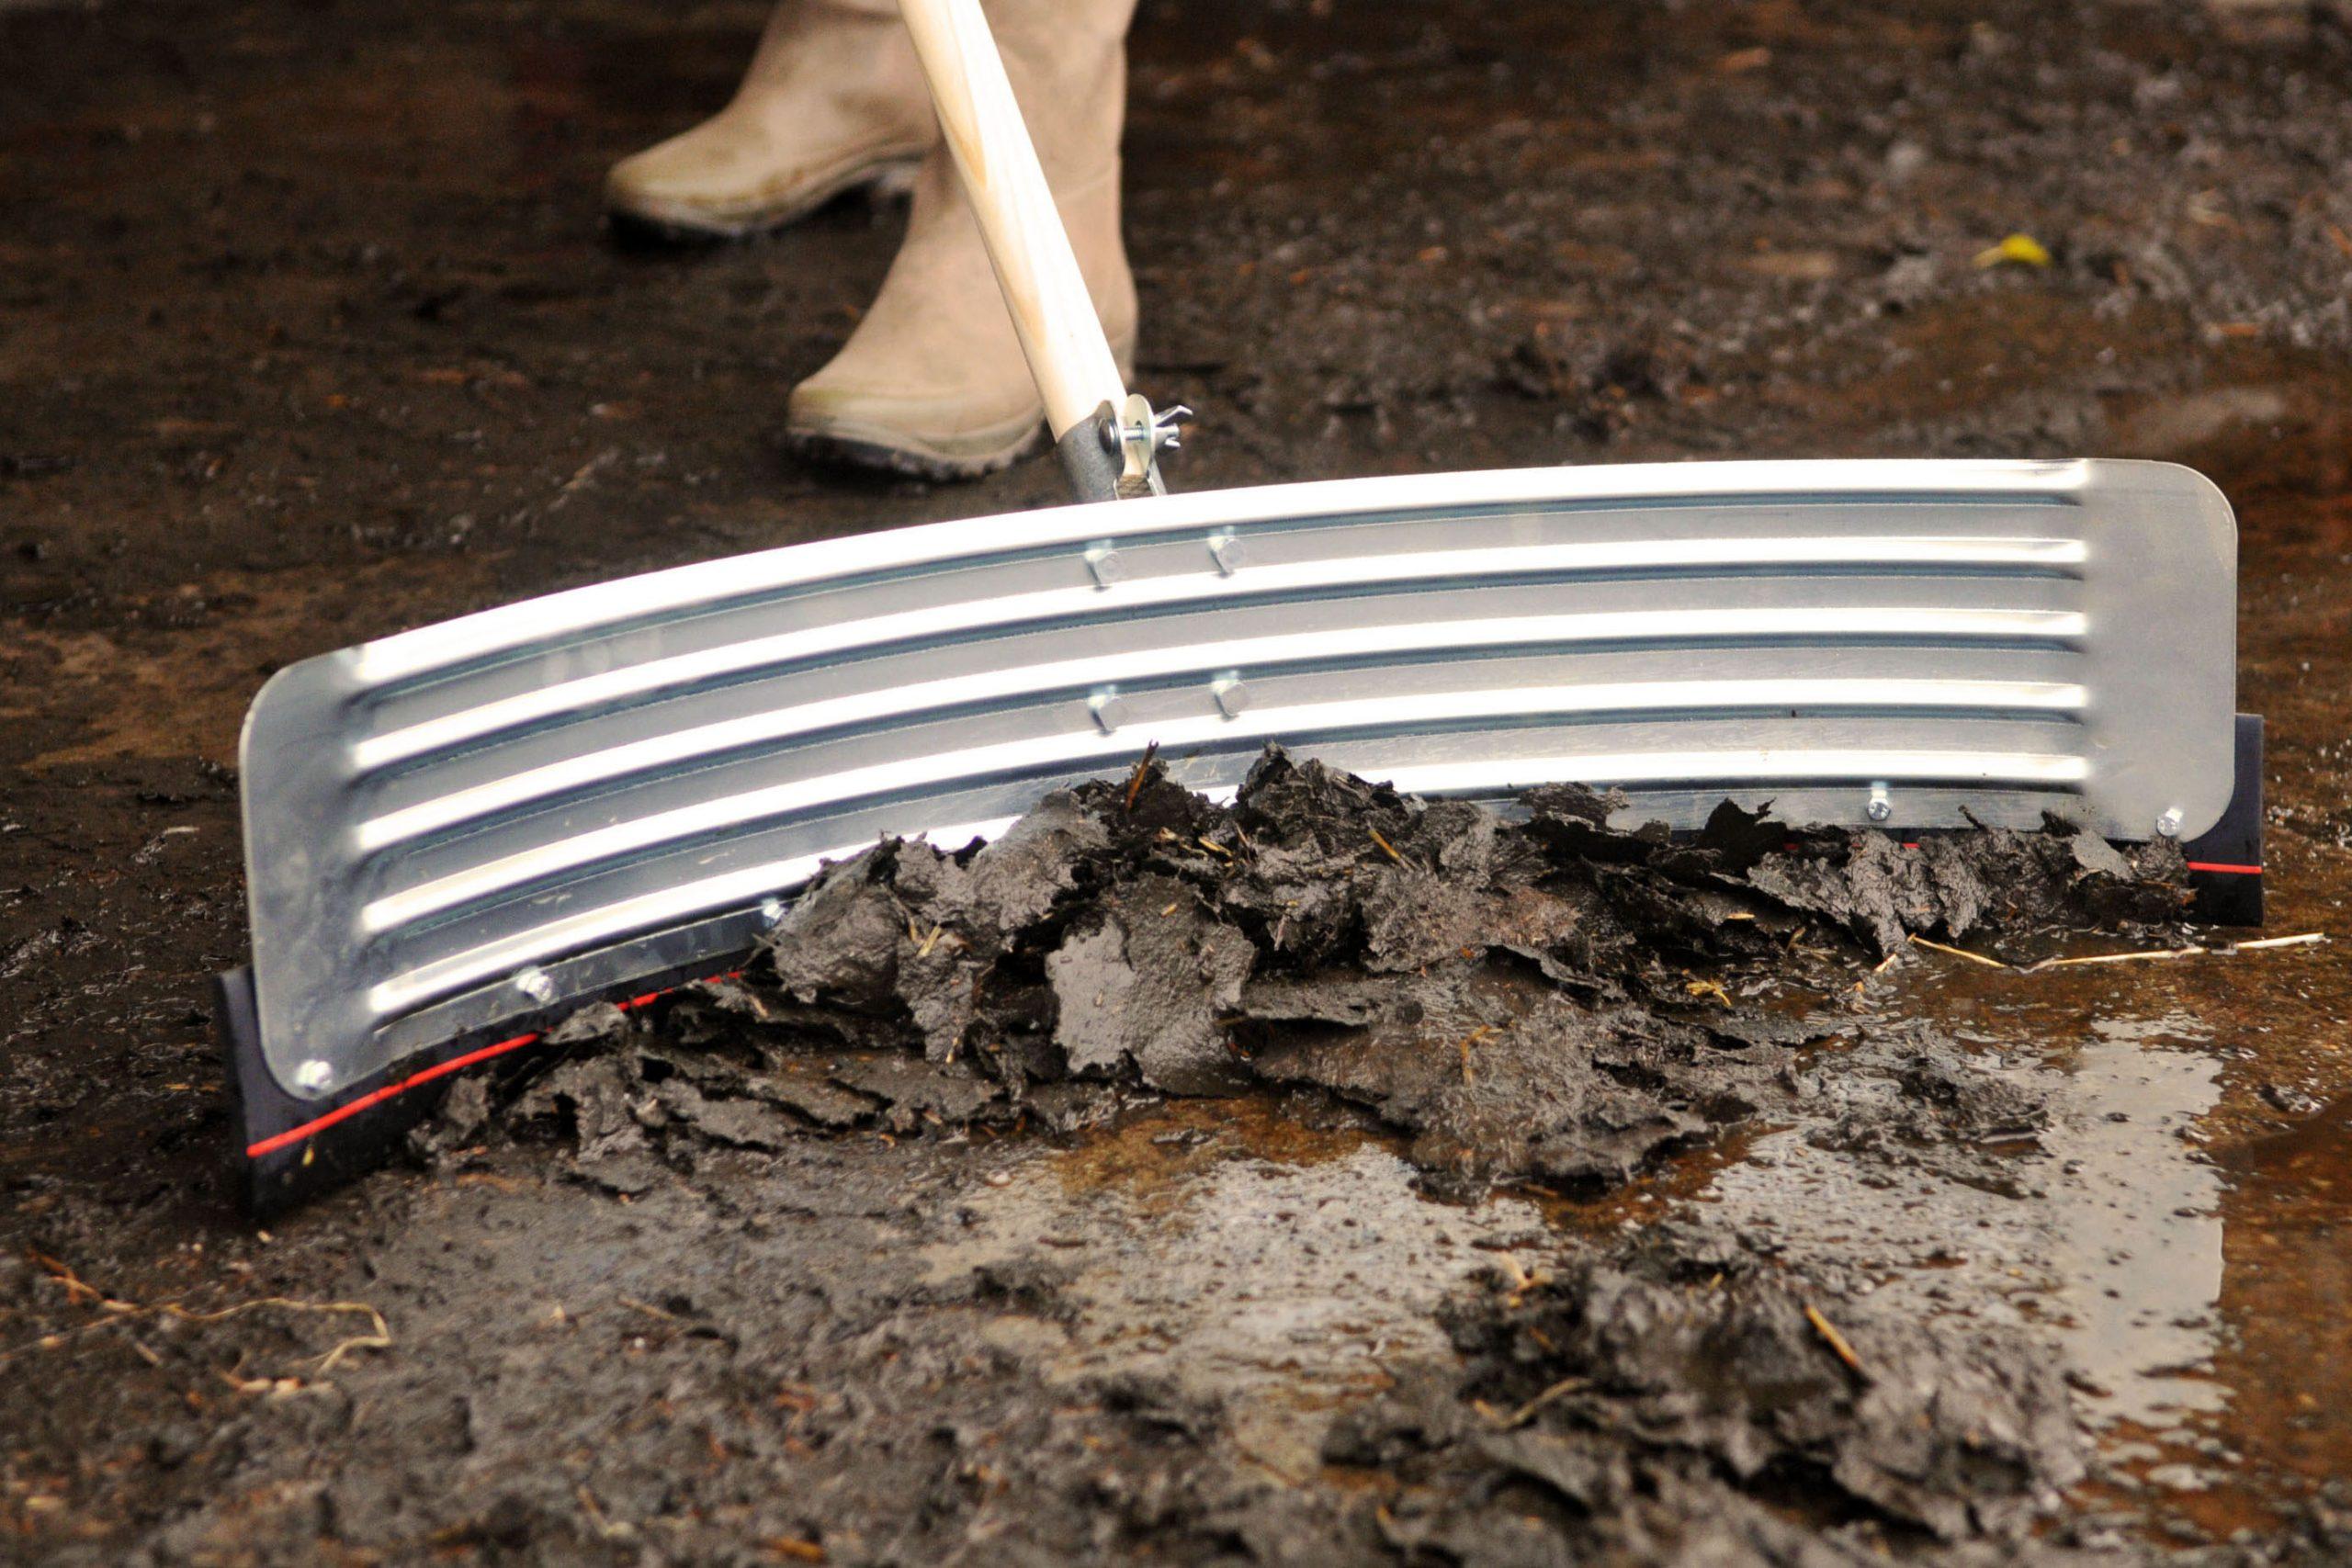 curved-squeegee-yard-scraper-farming